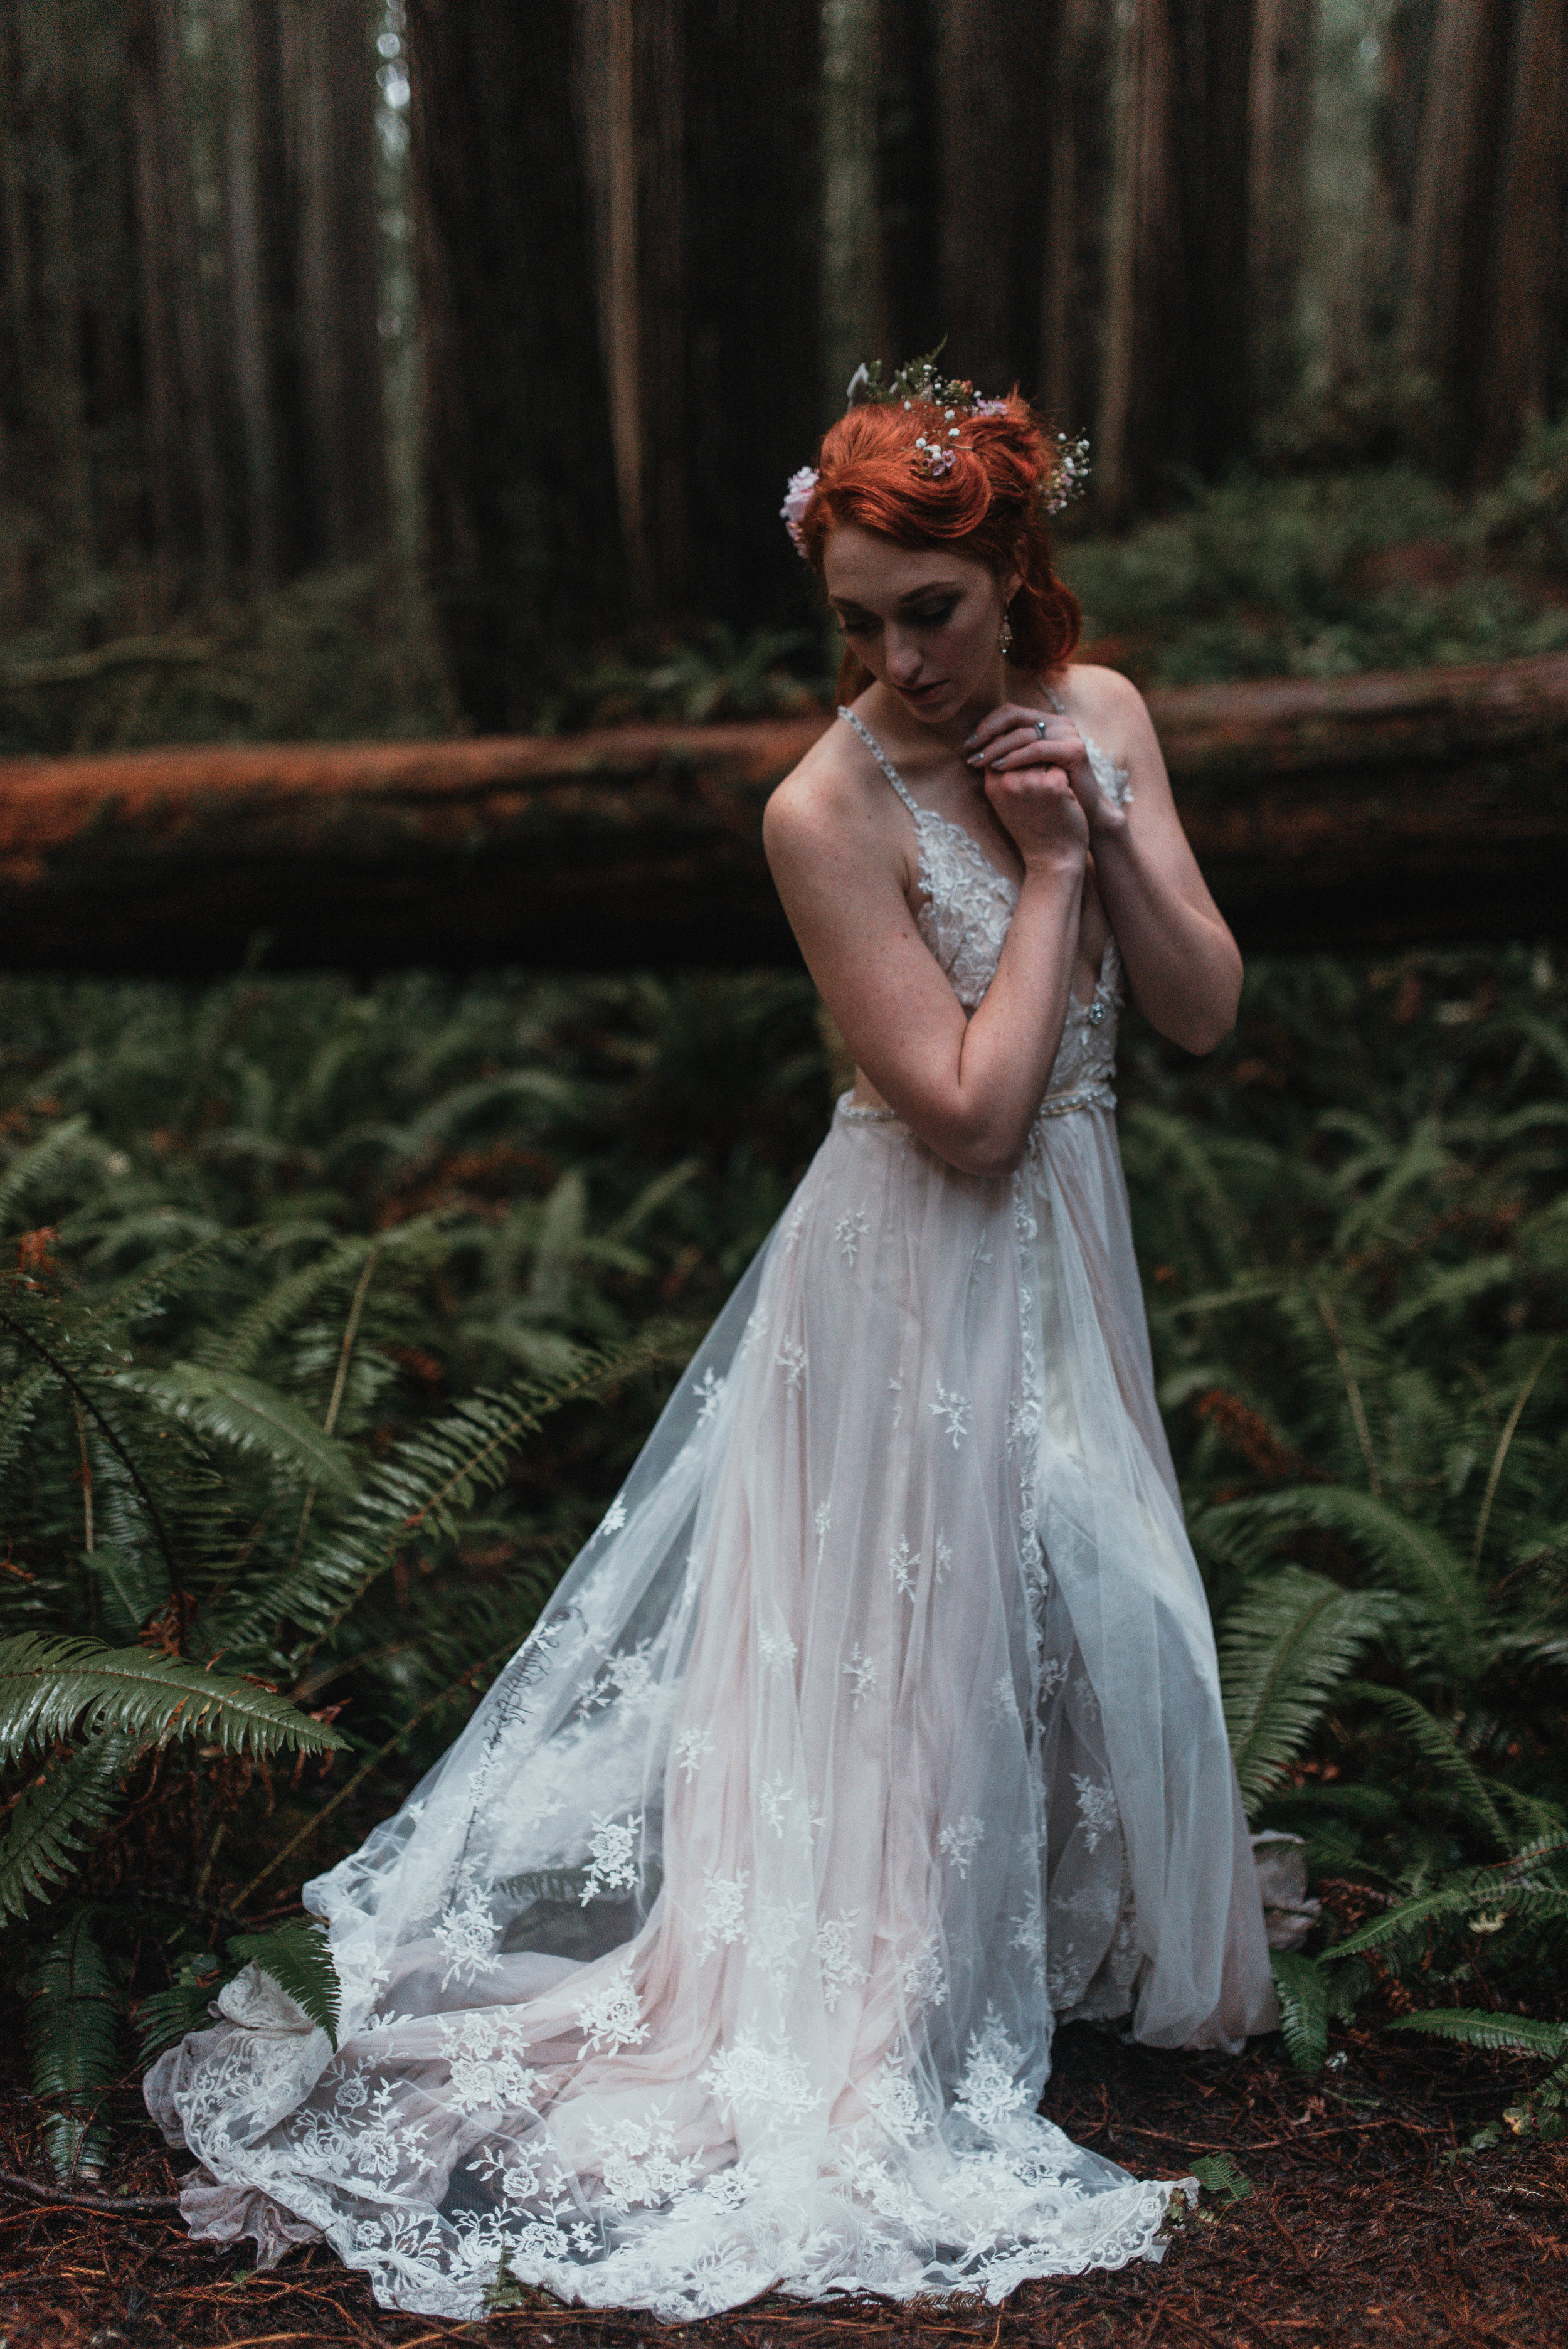 Intimiate Redwoods Elopement , Elopement Inspiration, Jessica Heron Images, Northern California Elopement, Oregon Elopement, Oregon Wedding, Elopement Ideas, diy dress